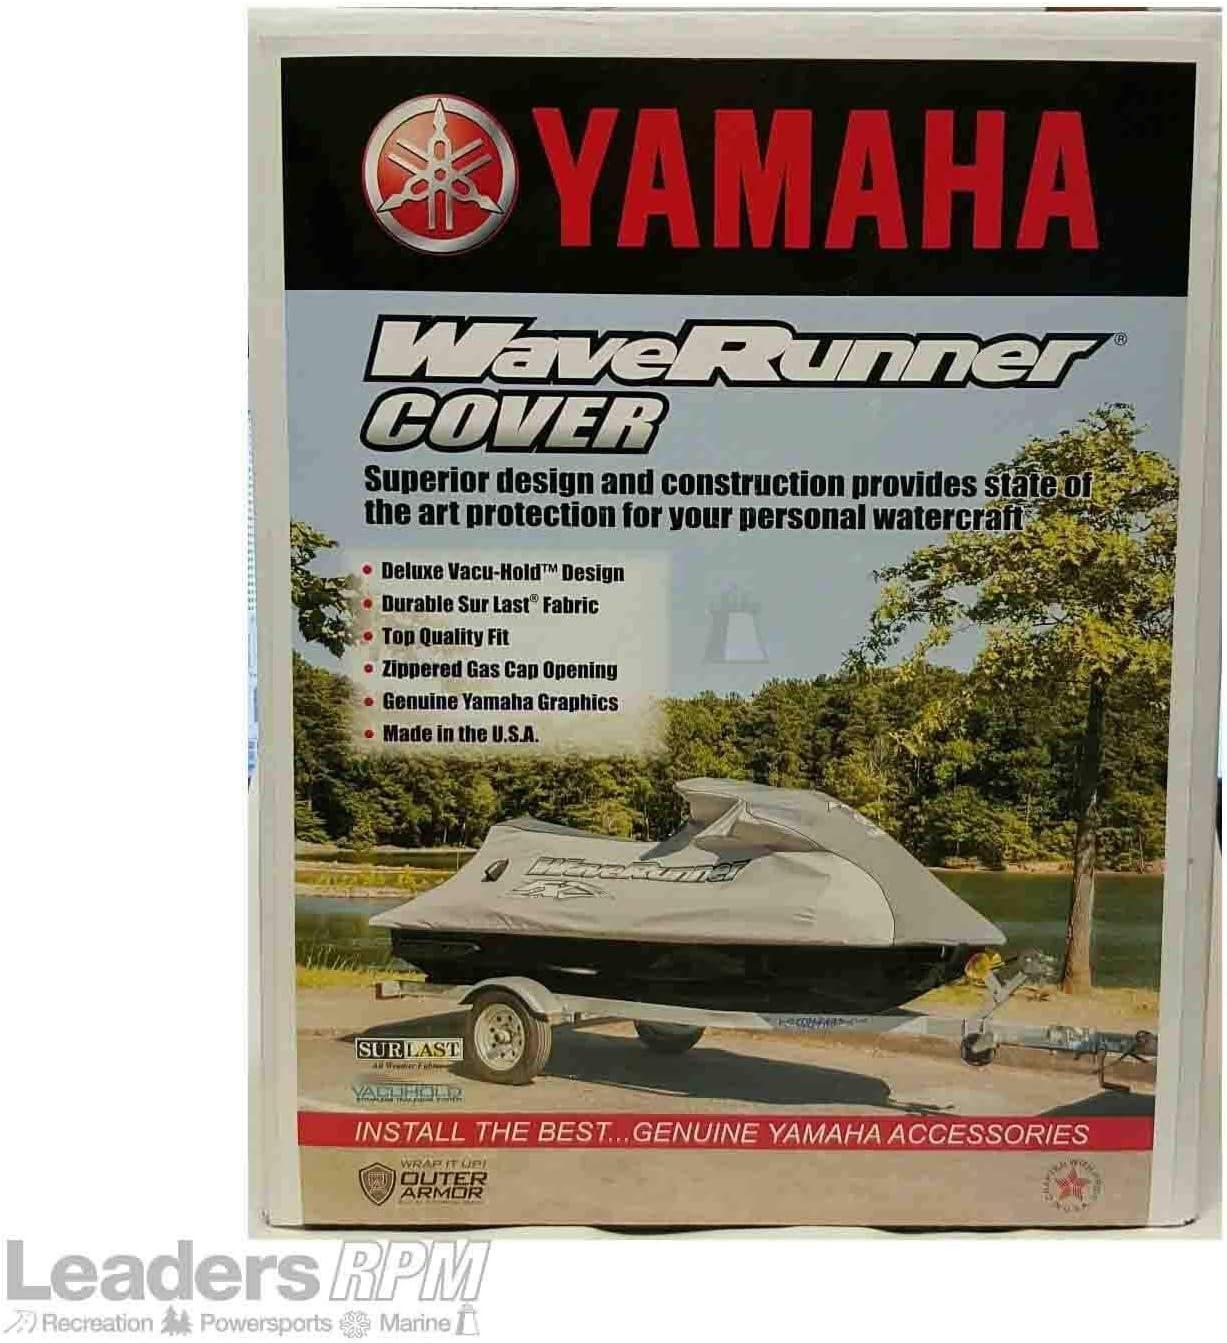 1300 Waverunner Cover Yamaha OEM GPR 800 MWV-UNIGP-00-19 1200